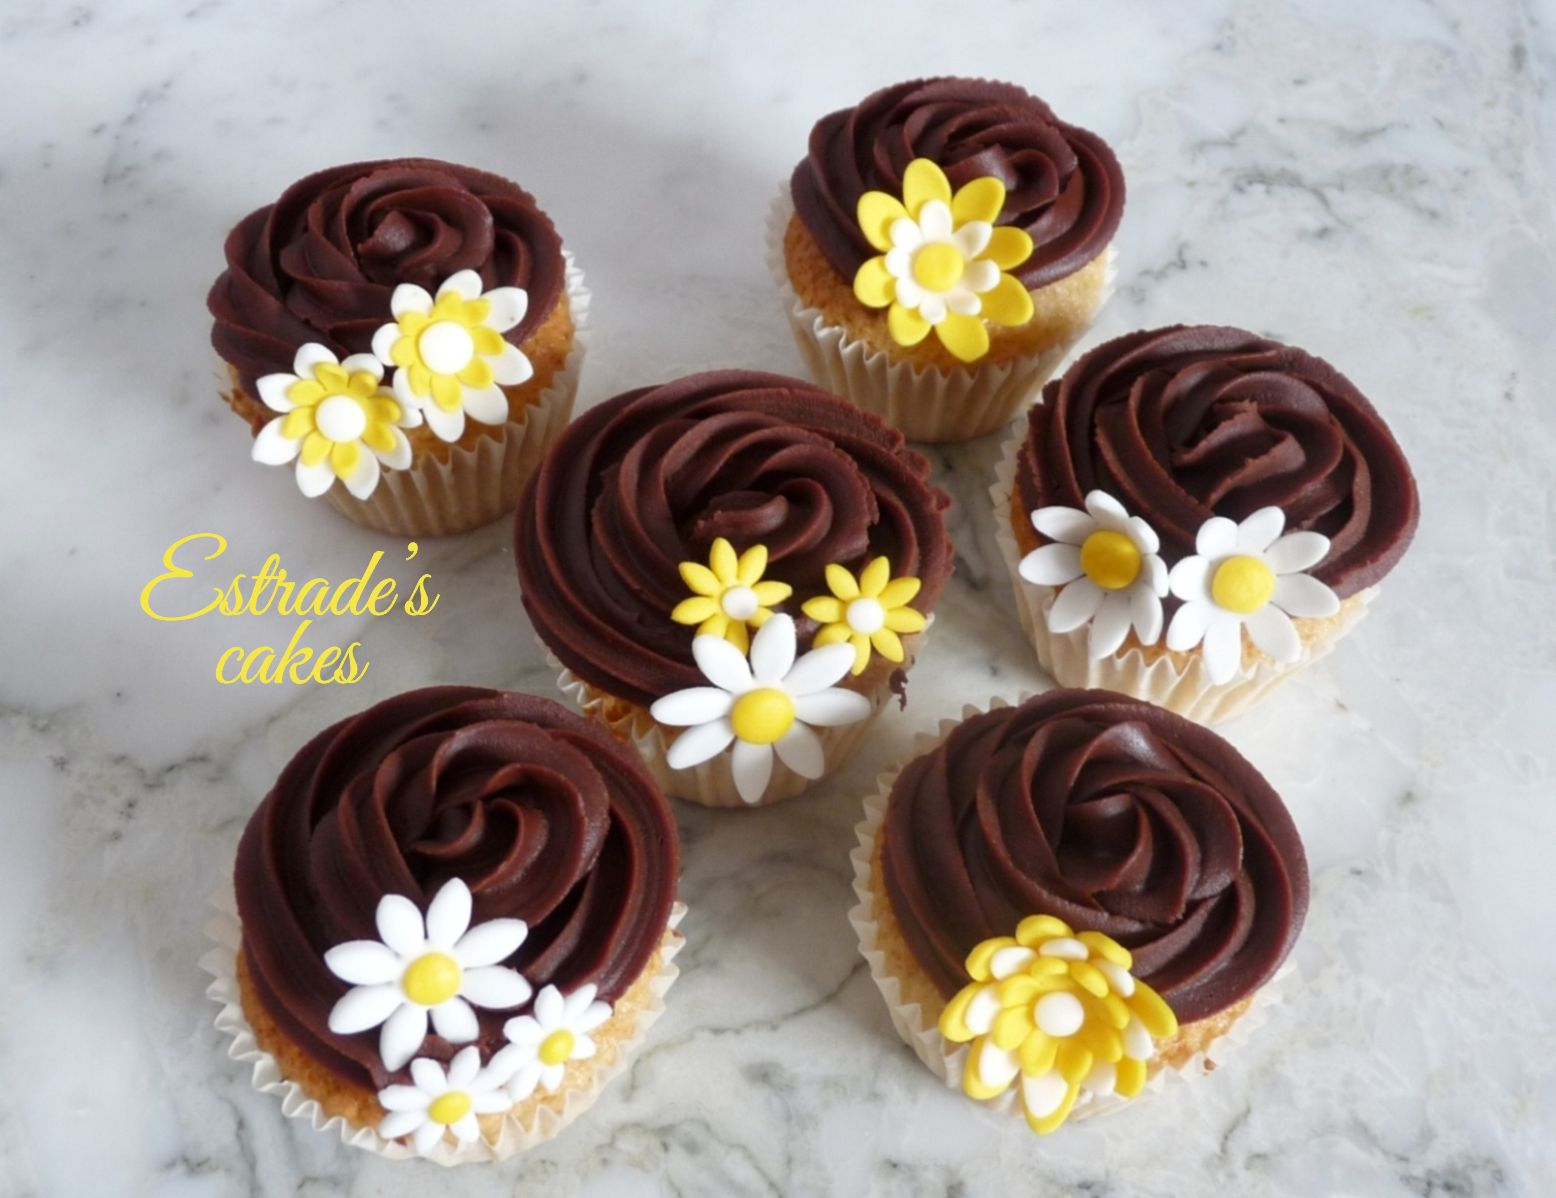 cupcakes de almendra con ganache de chocolate decorado con flores - 2